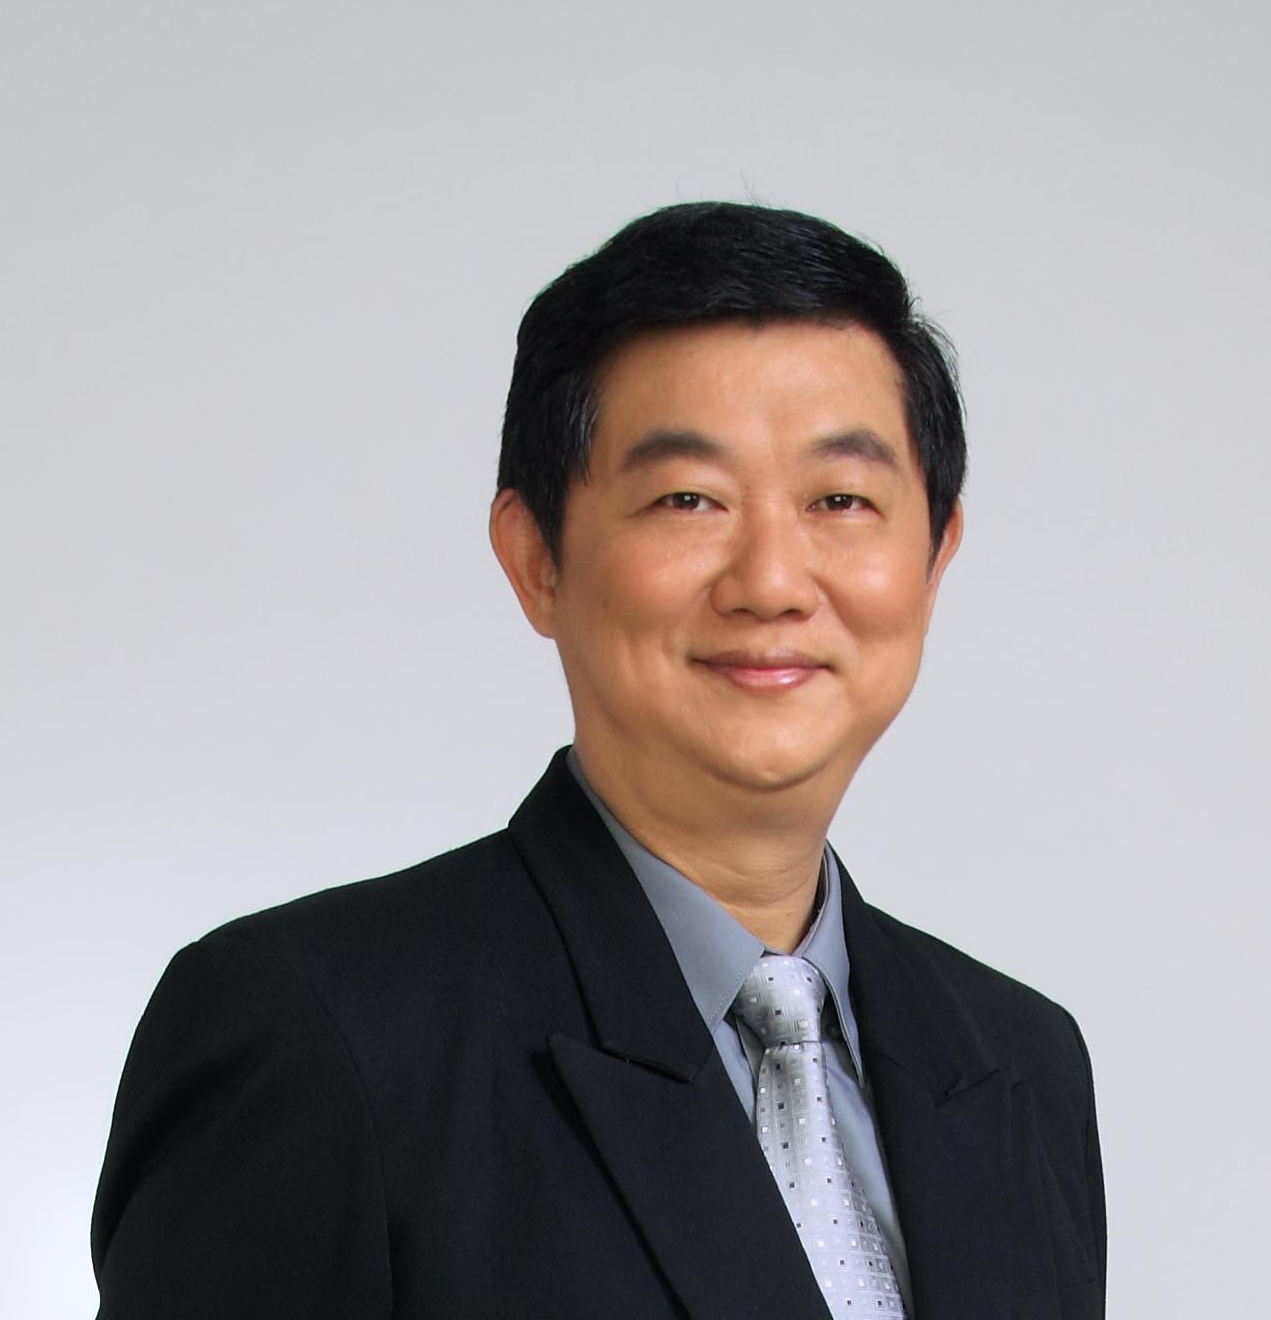 Nelson Kwei - Artistic Director